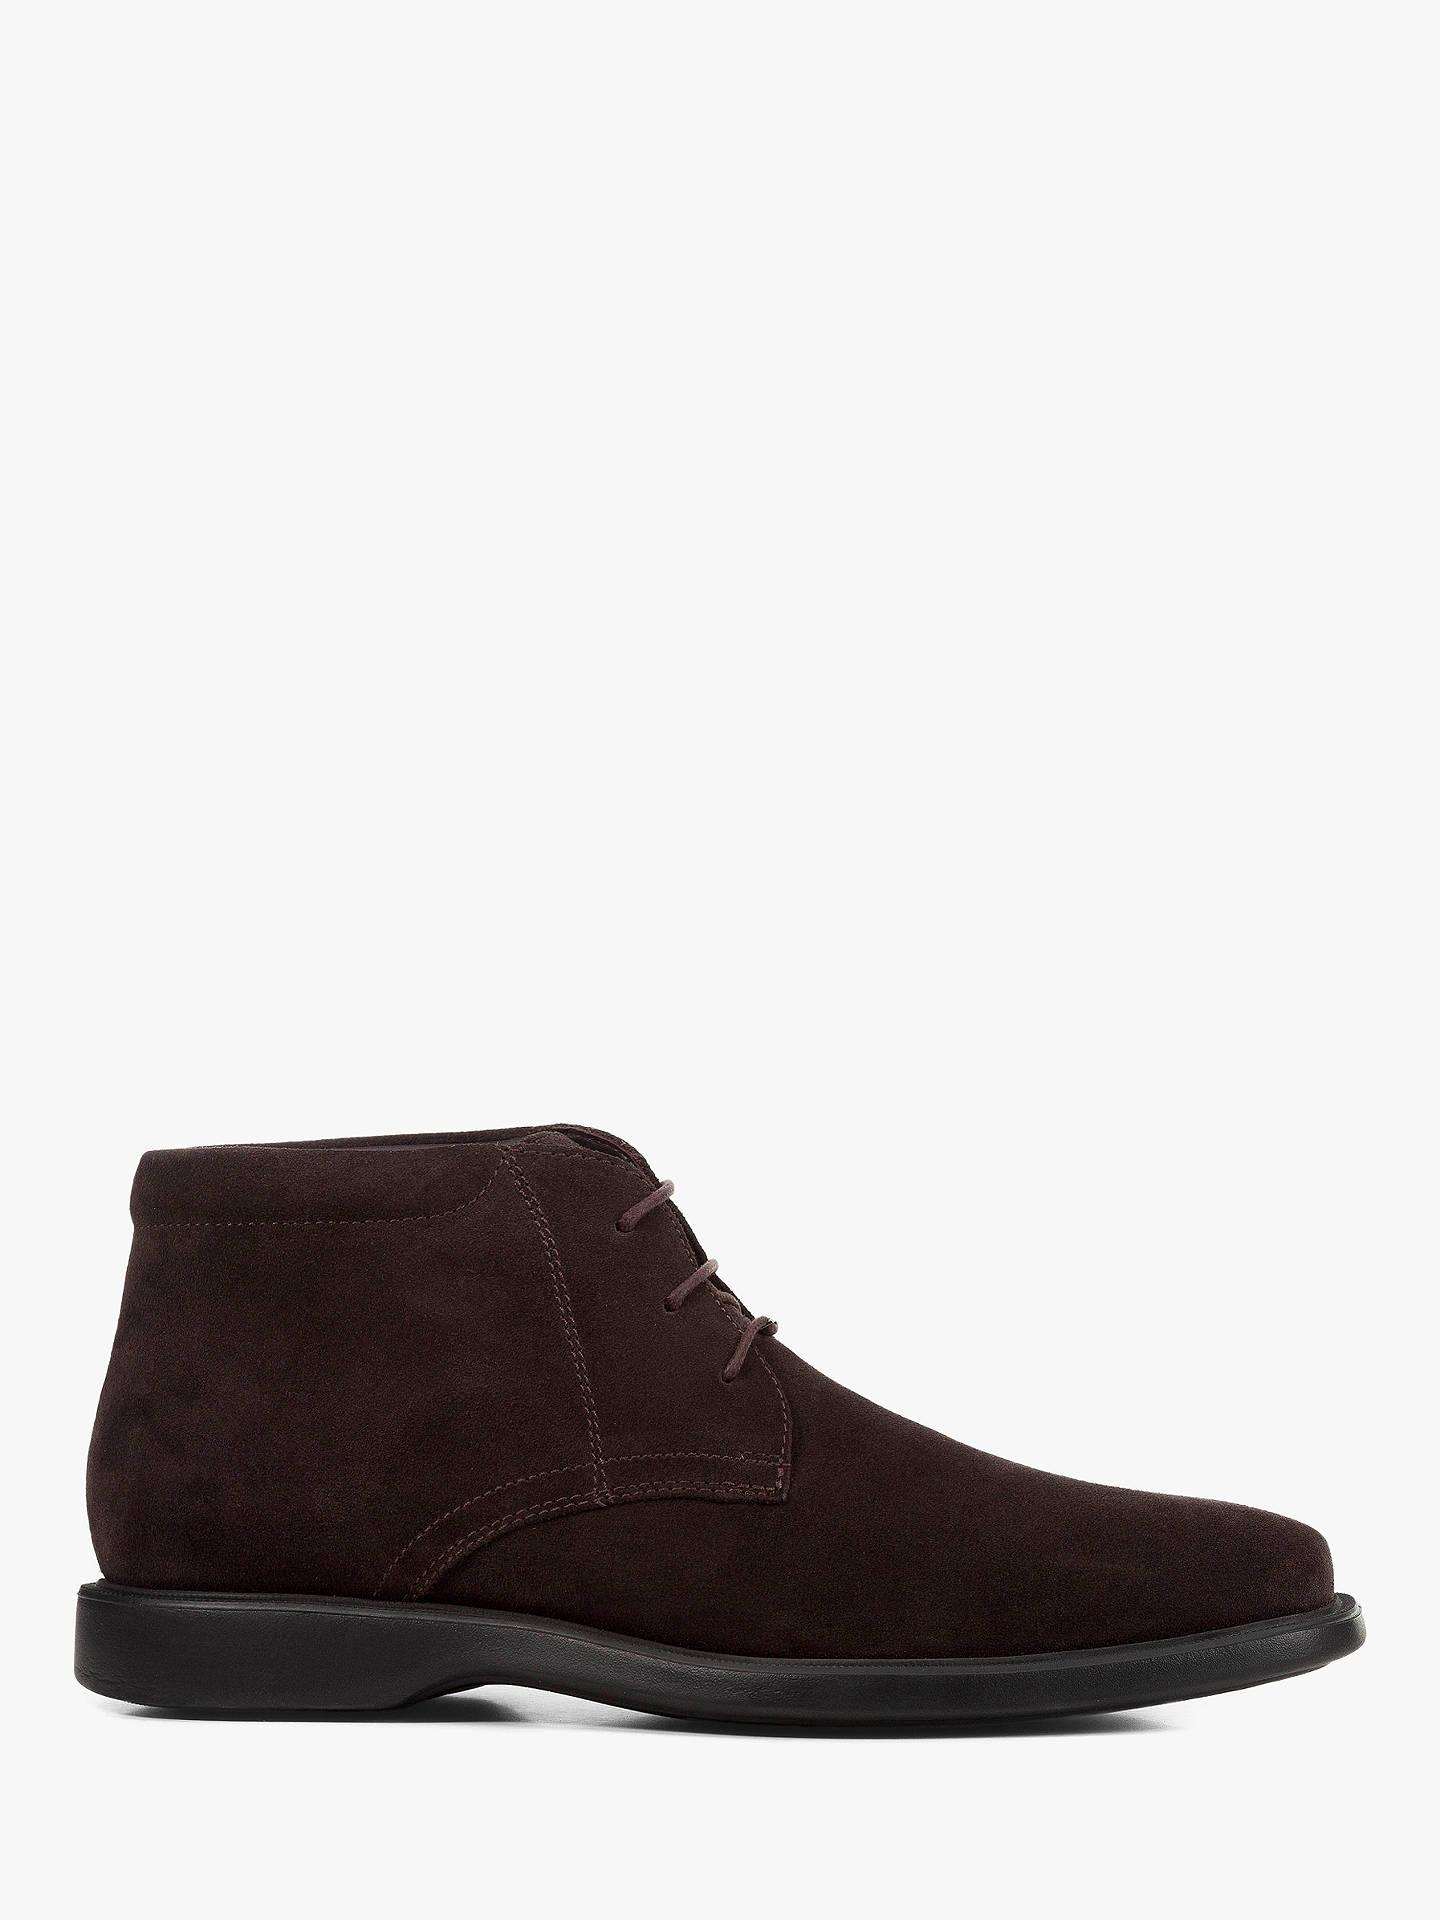 616fb3340d Buy Geox Brayden Amphibiox Waterproof Leather Chukka Boots, Coffee, 7  Online at johnlewis.